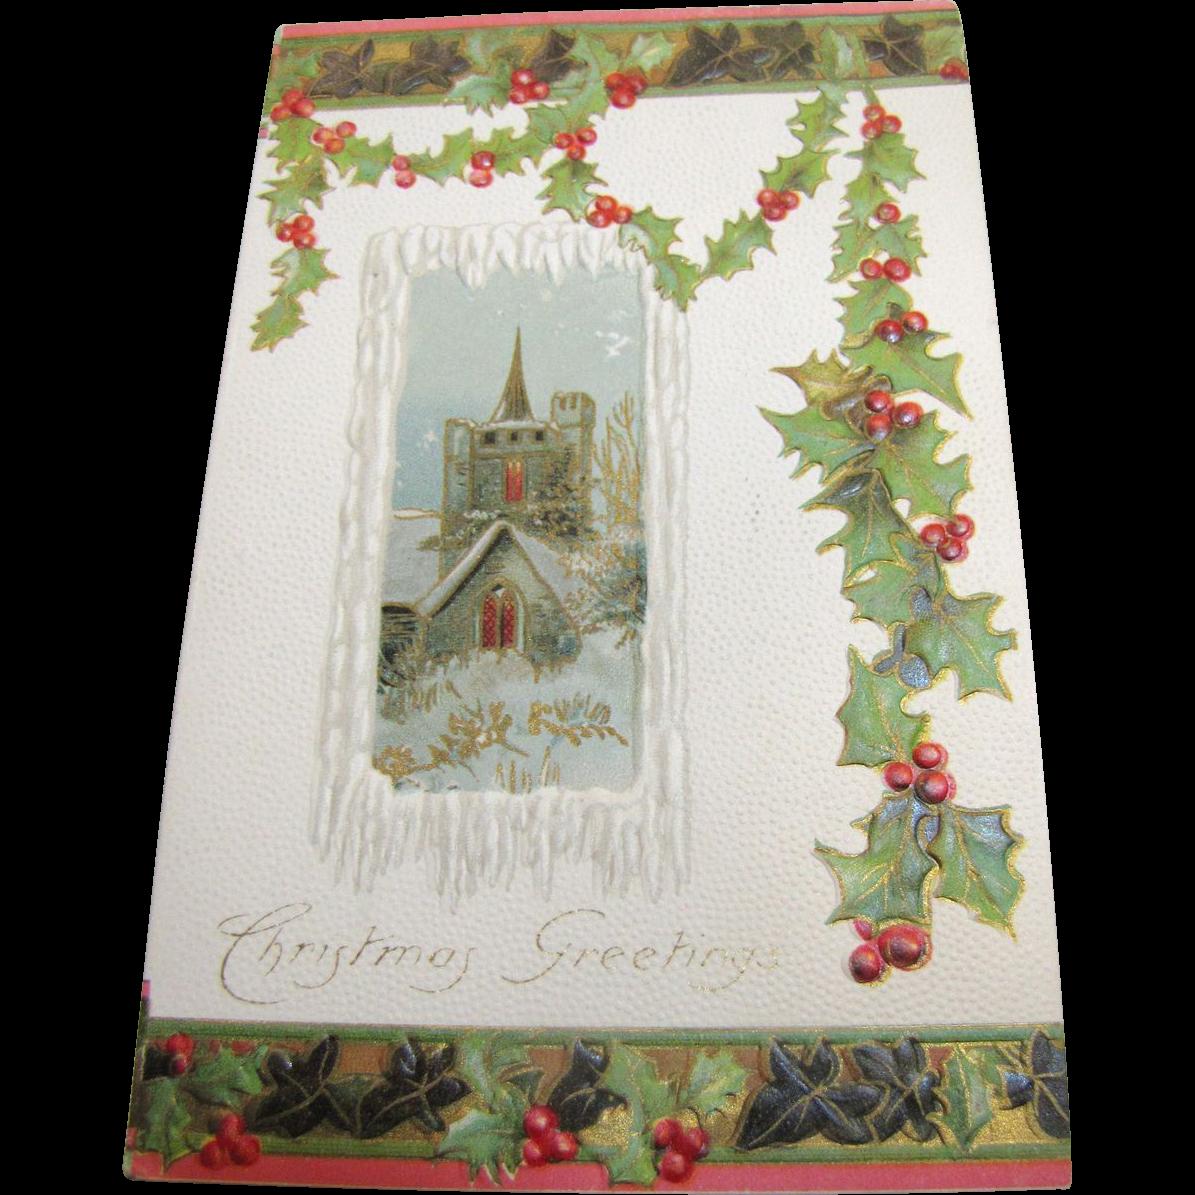 1908, Seasons Greetings Christmas Card Gilt & Embossed